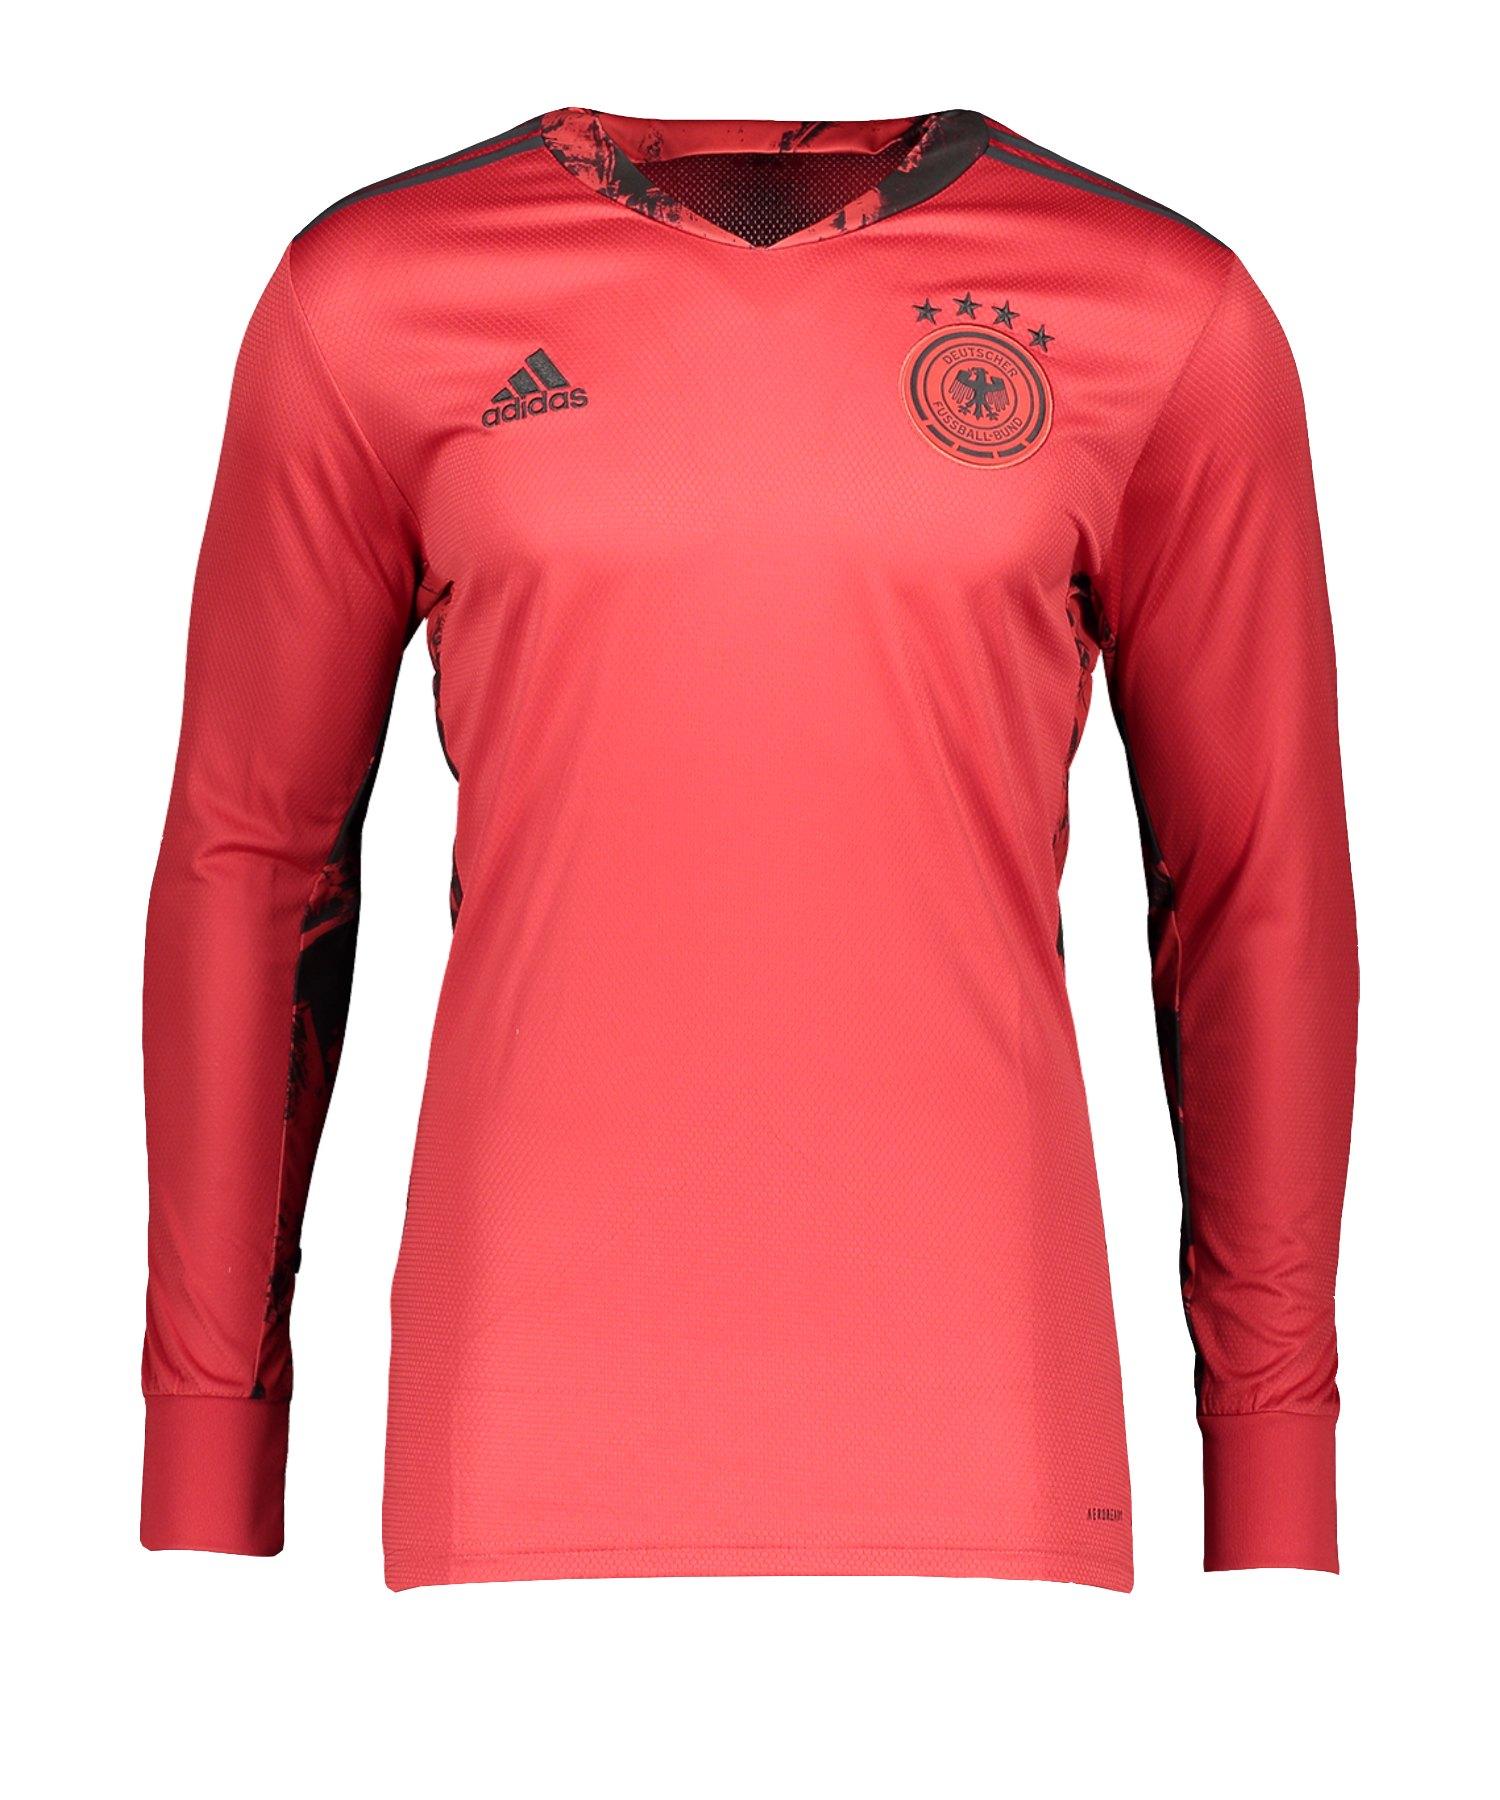 adidas DFB Deutschland Torwarttrikot EM 2020 Rot - rot